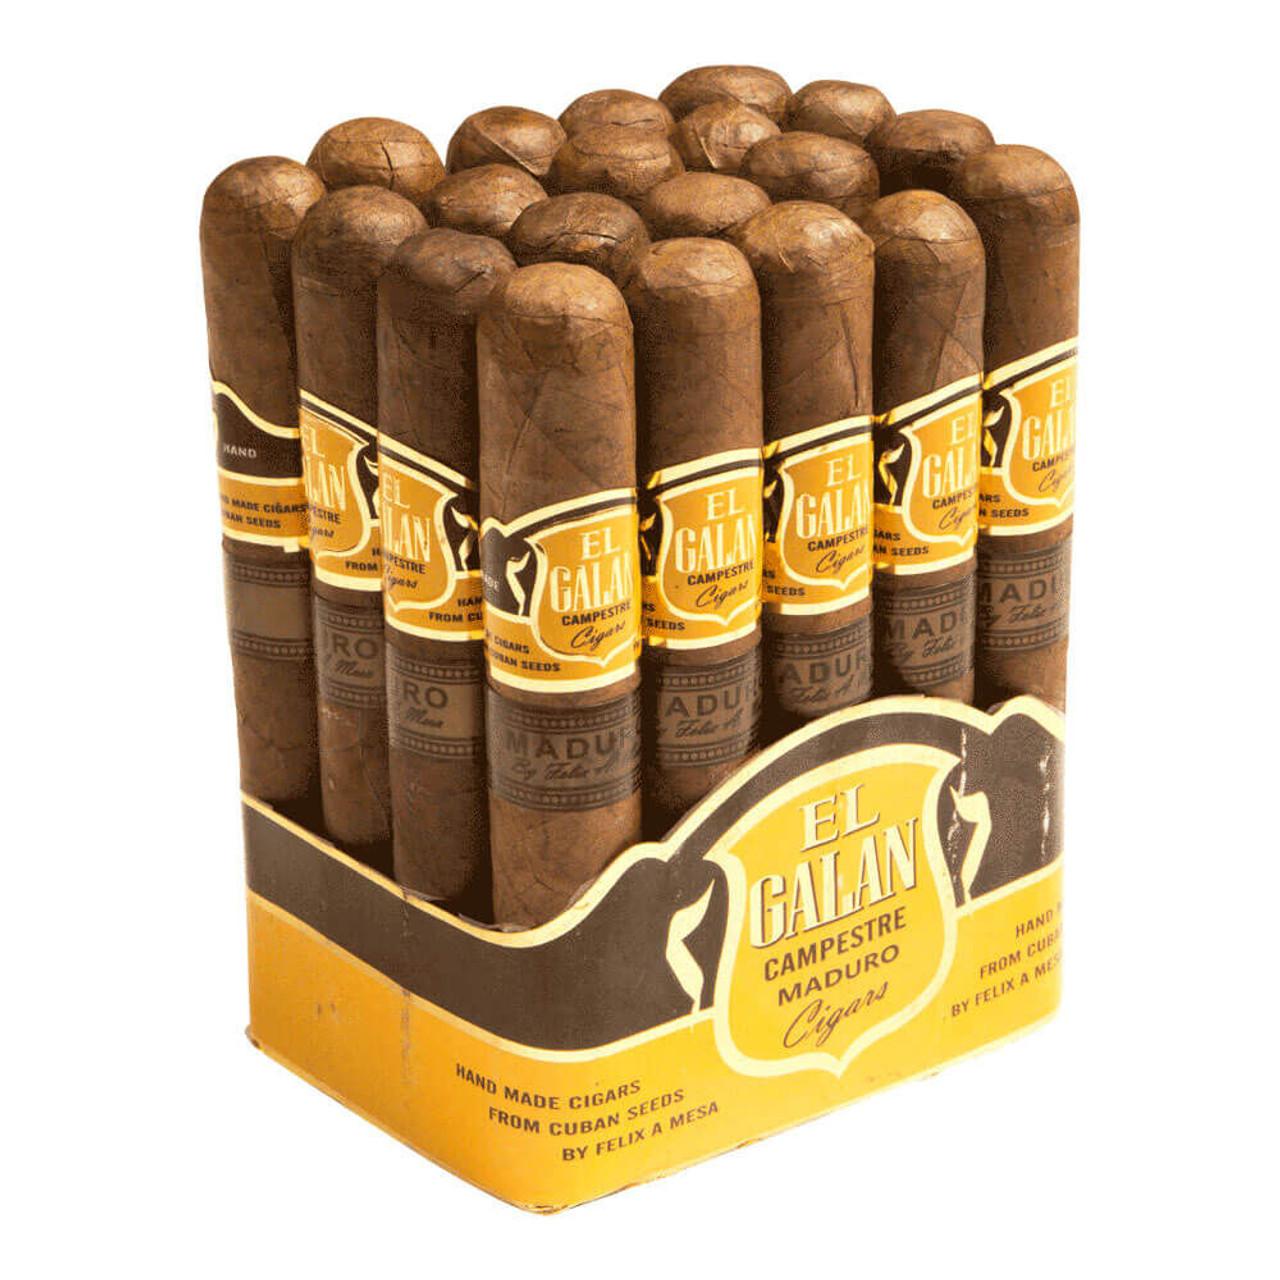 El Galan Campestre Churchill Maduro Cigars - 7.0 x 48 (Bundle of 20)